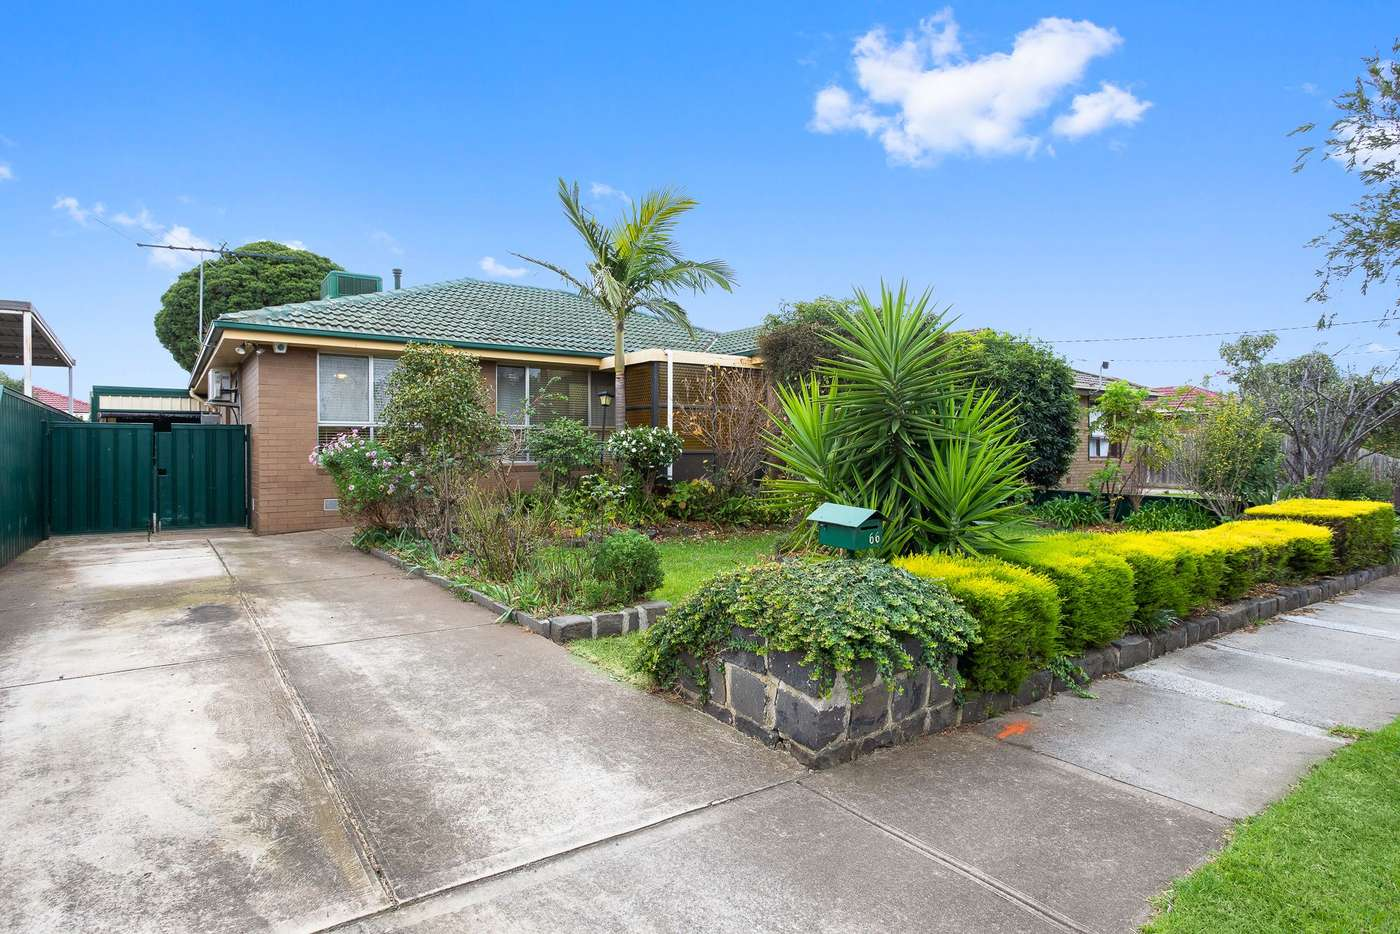 Main view of Homely house listing, 66 Trafalgar Street, Albanvale VIC 3021